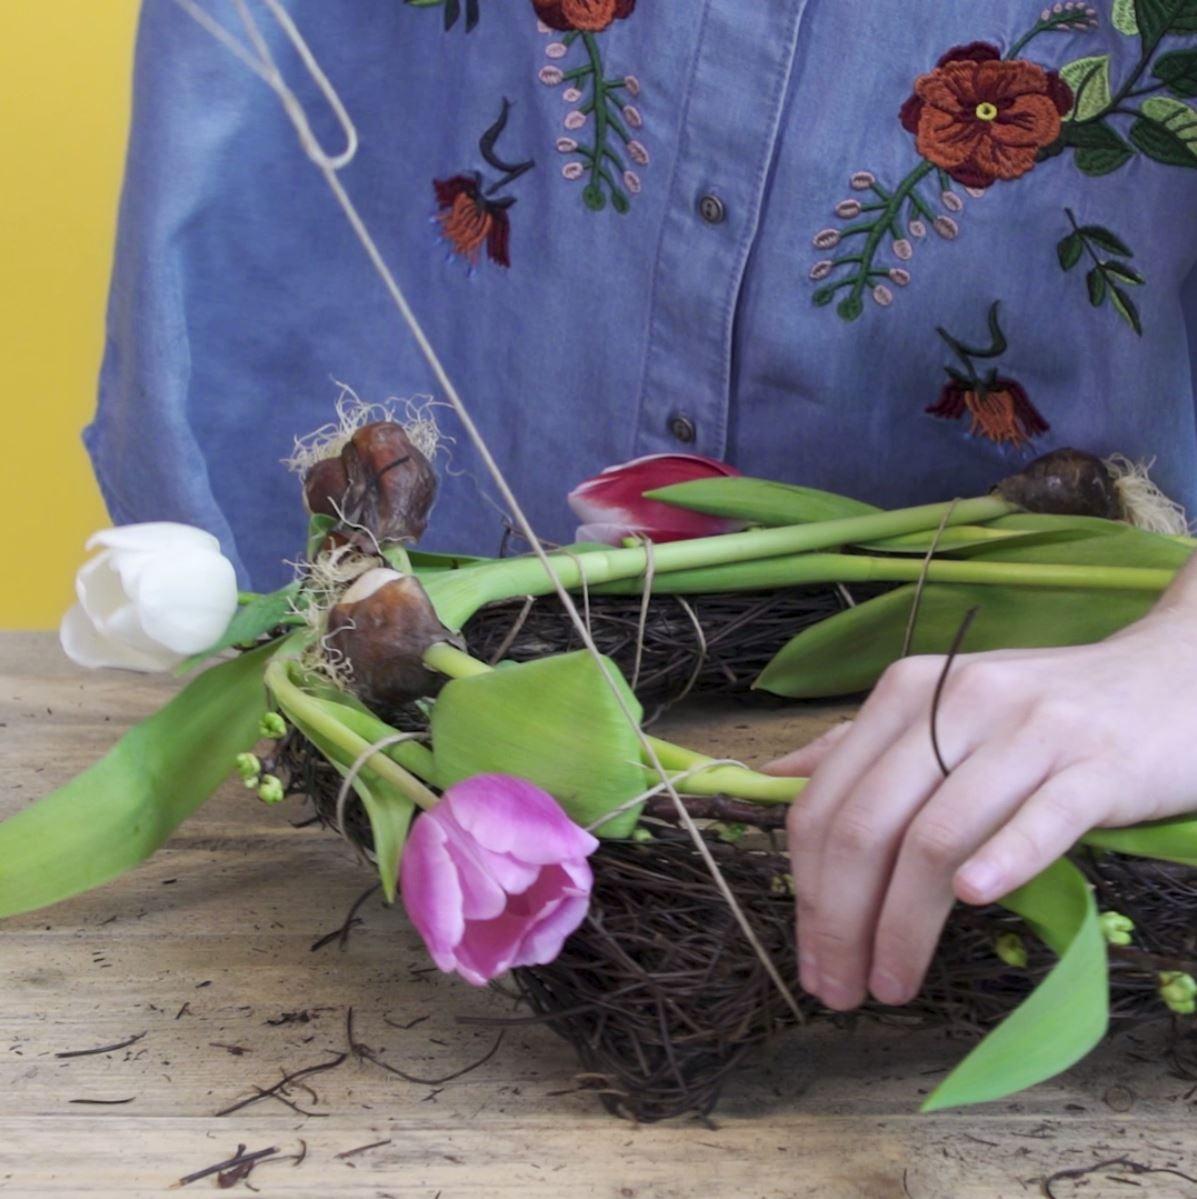 DIY Tulpenkrans stap 3: Tulpen bevestigen